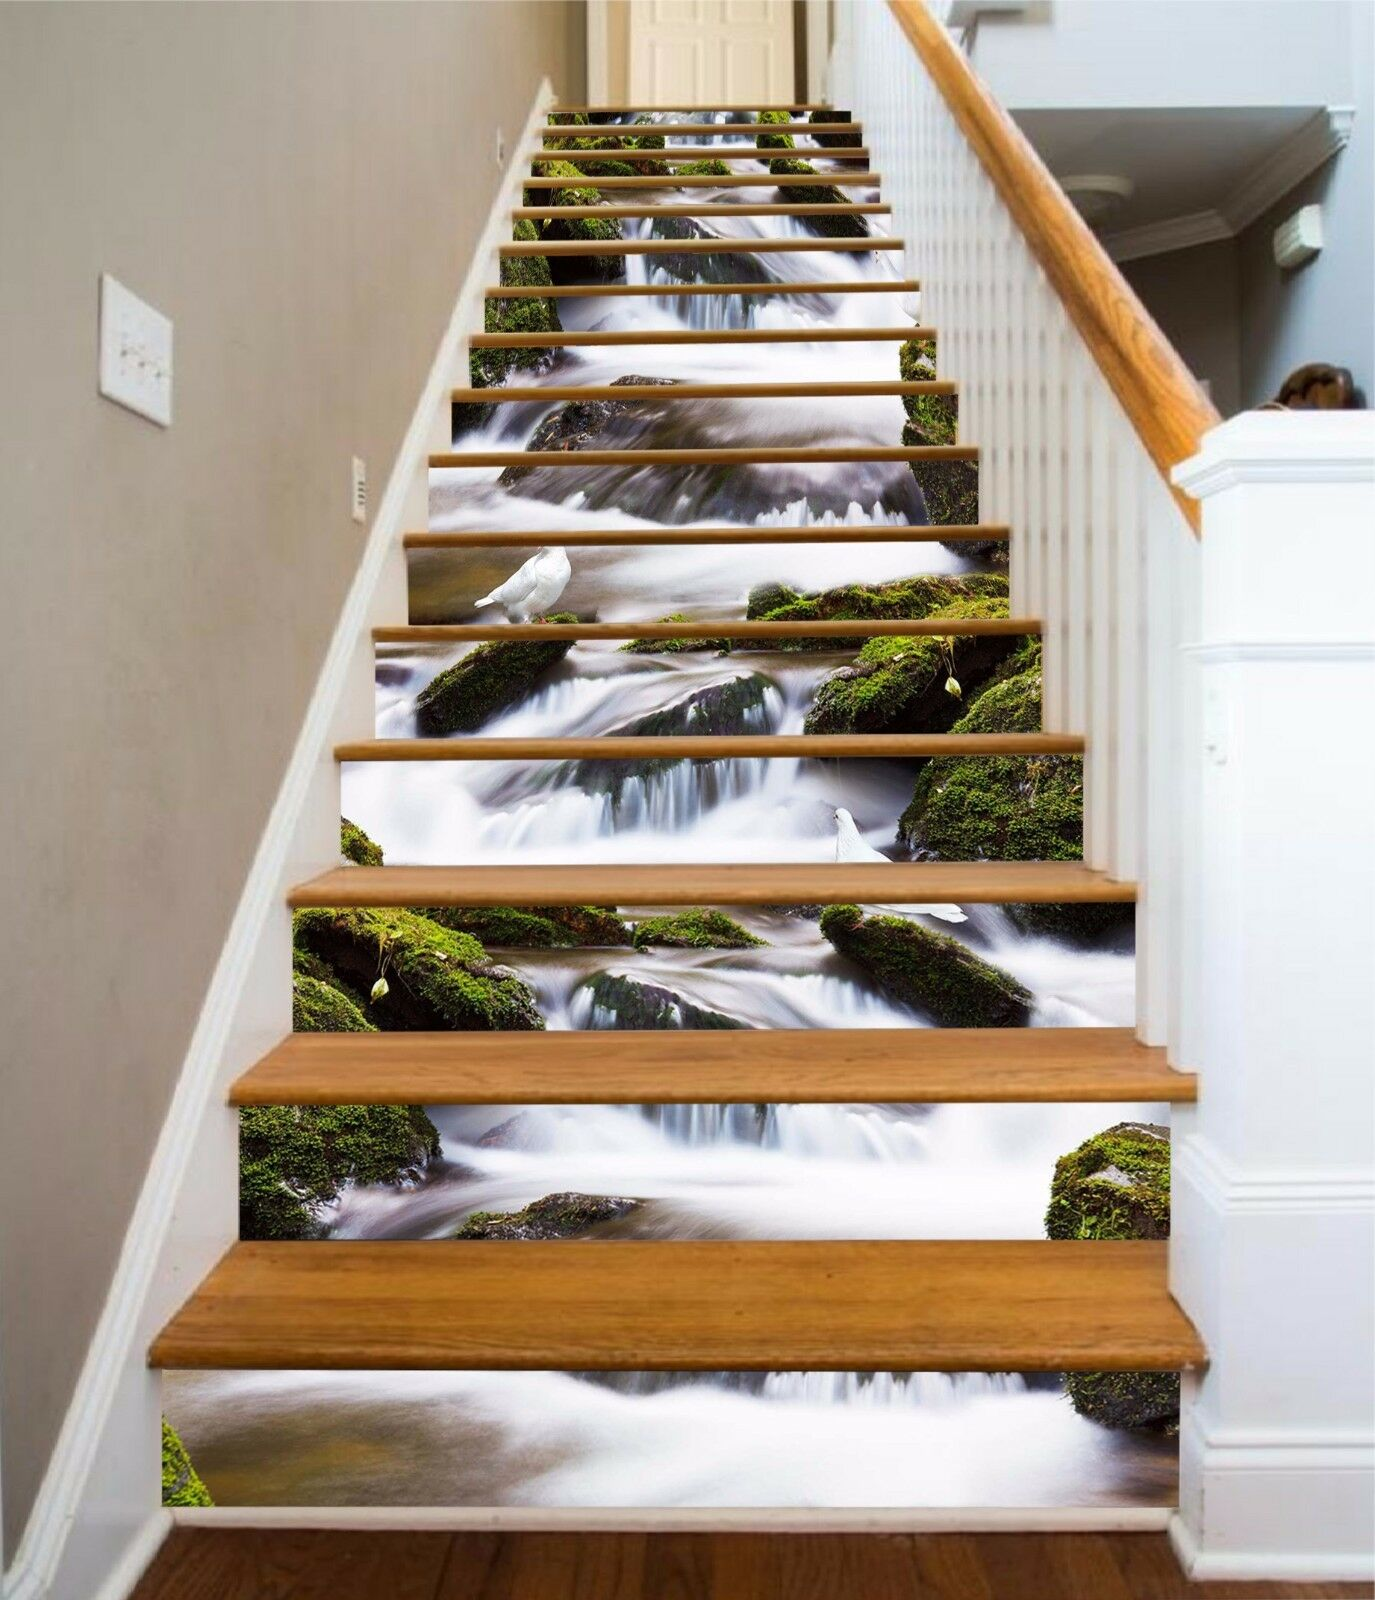 3D Gurgling Creek 75Stair Risers Decoration Photo Mural Vinyl Decal Wallpaper AU